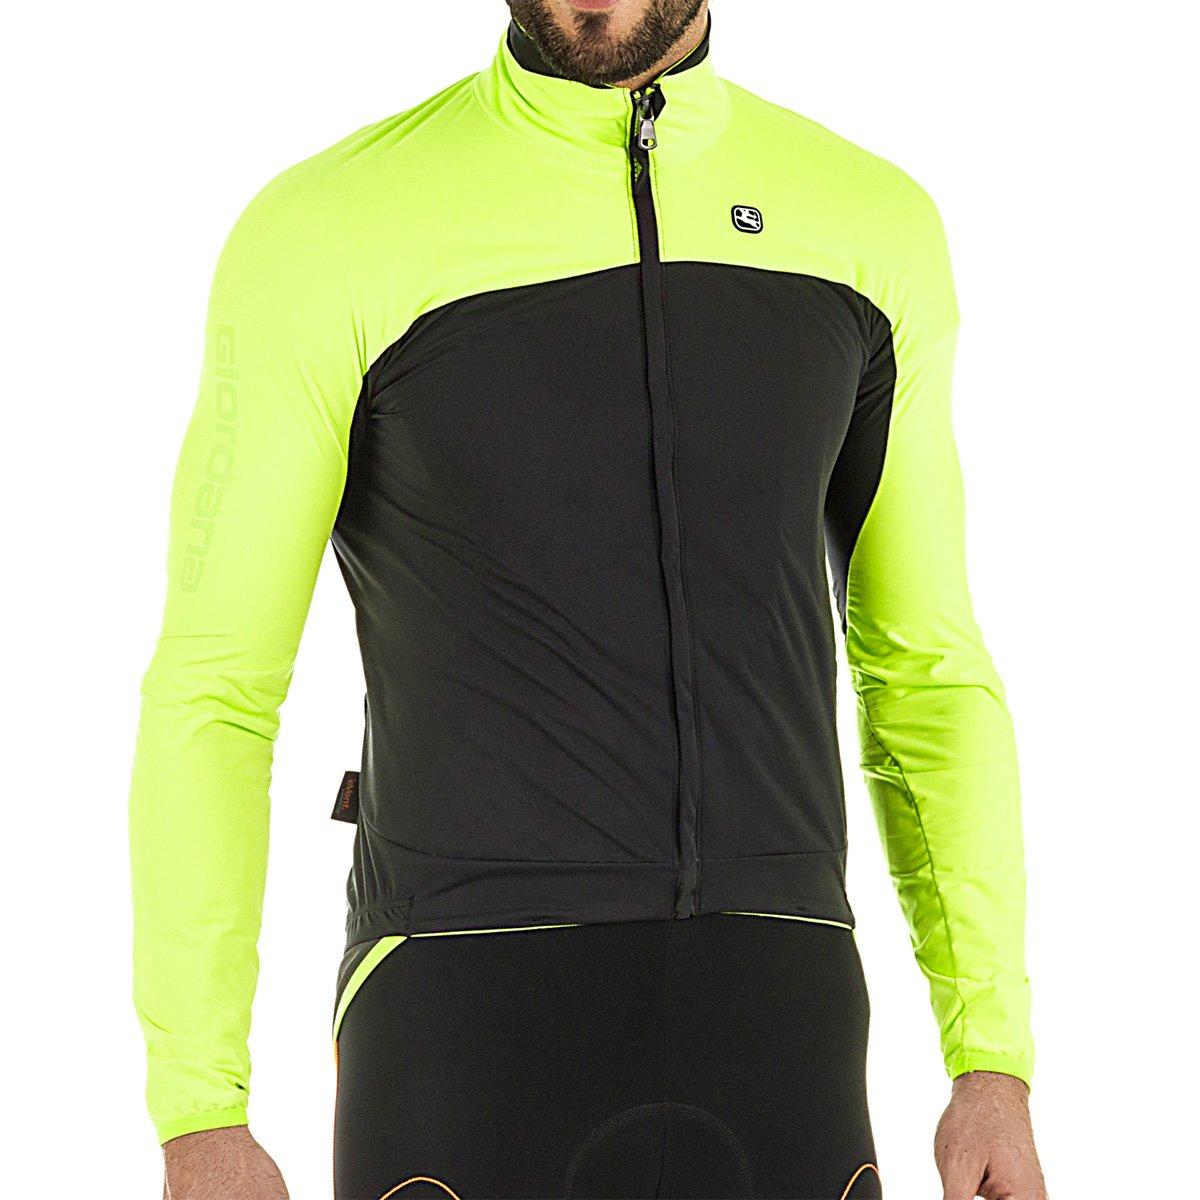 Giordana 2017 /18 Men 's Aqua Vento 100 h20サイクリングジャケット – gicw16-jckt-1h20 B076D87GCP 3L|Yellow Fluo/Black Yellow Fluo/Black 3L